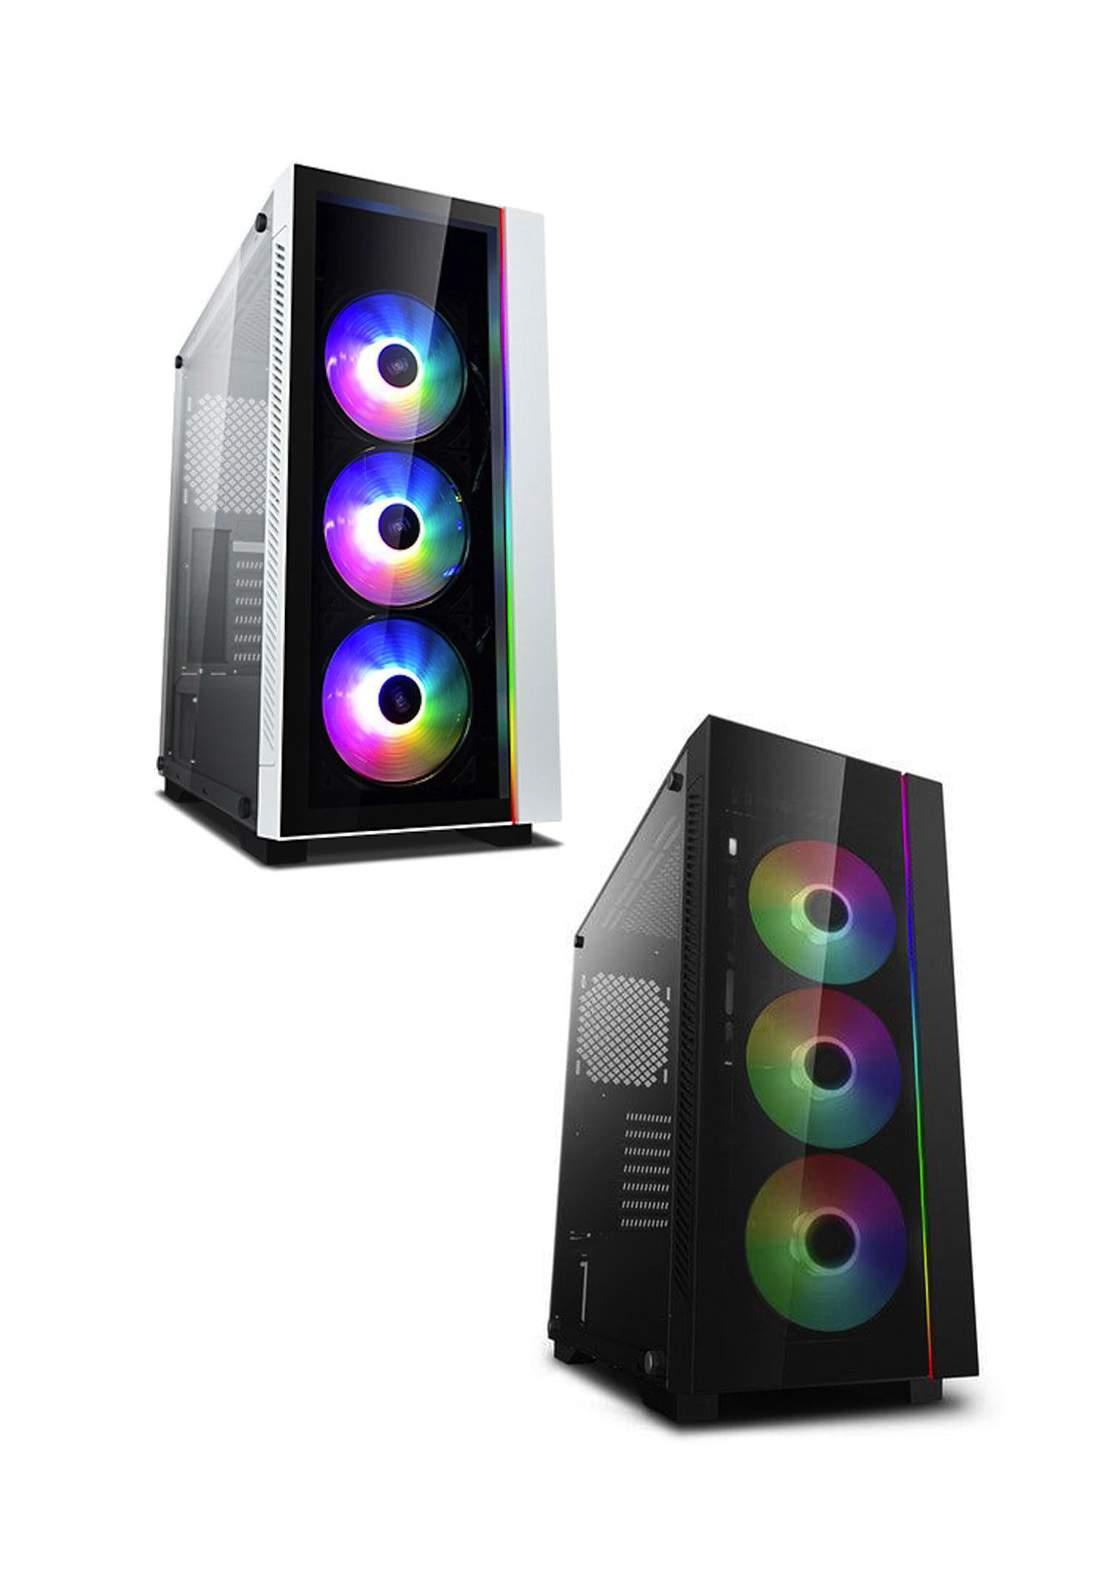 Deepcool Matrexx 55 V3 Rgb 3Fans Mid Tower Case كيس حاسبة